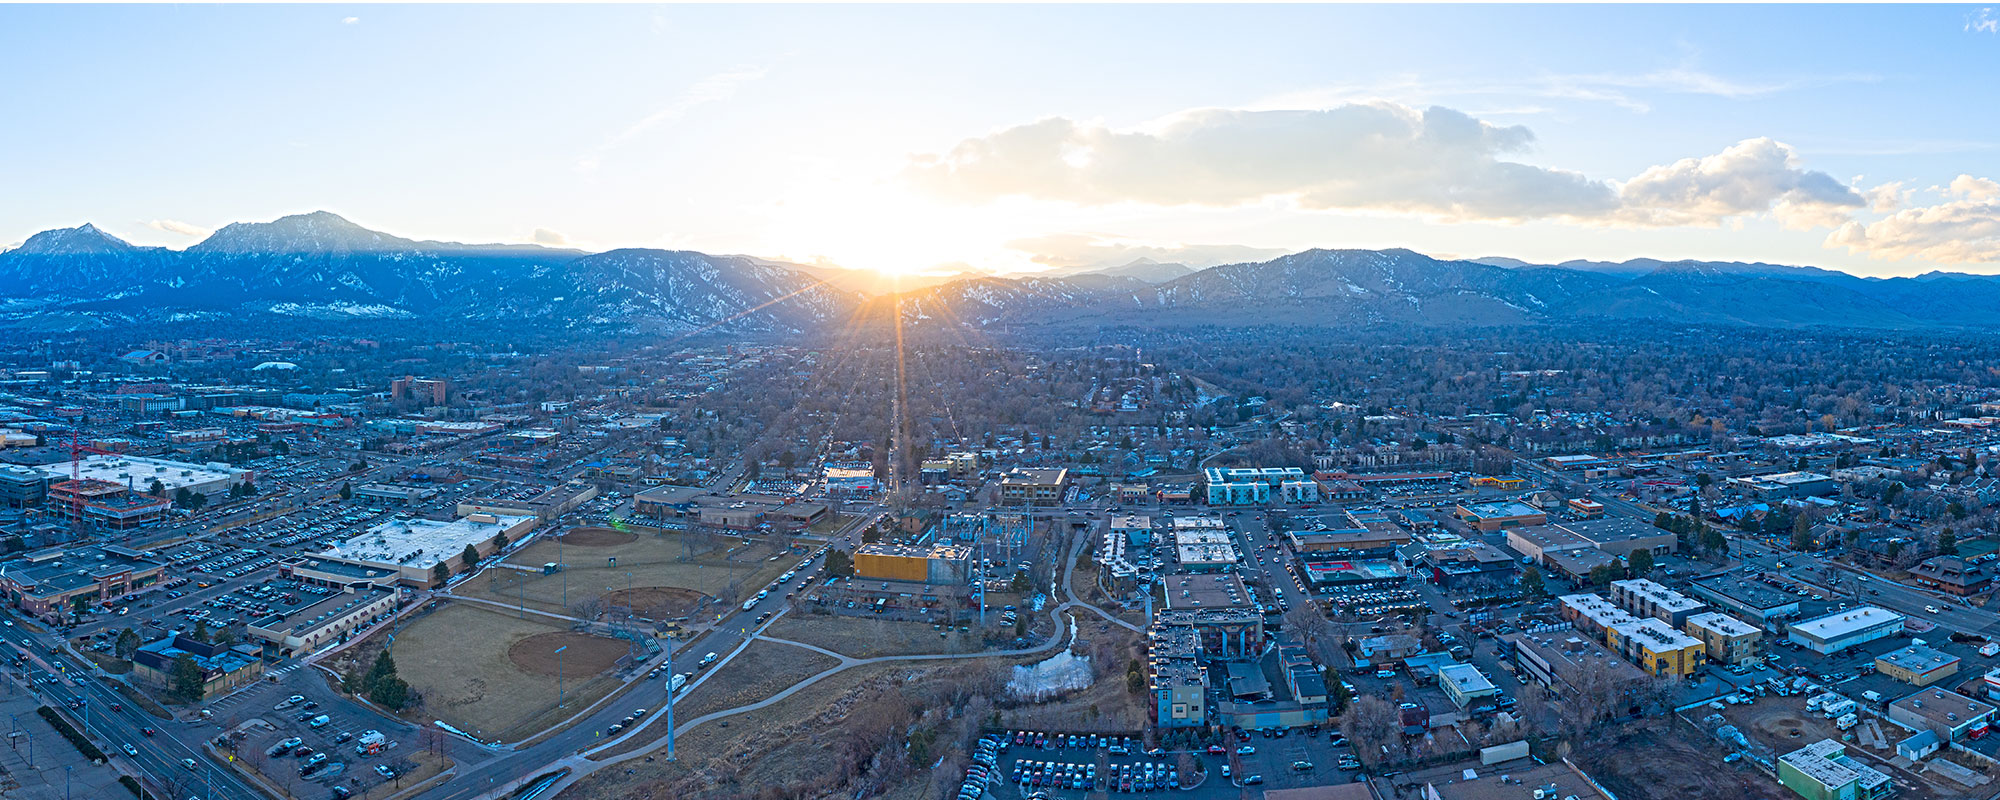 Boulder 472326616.jpg